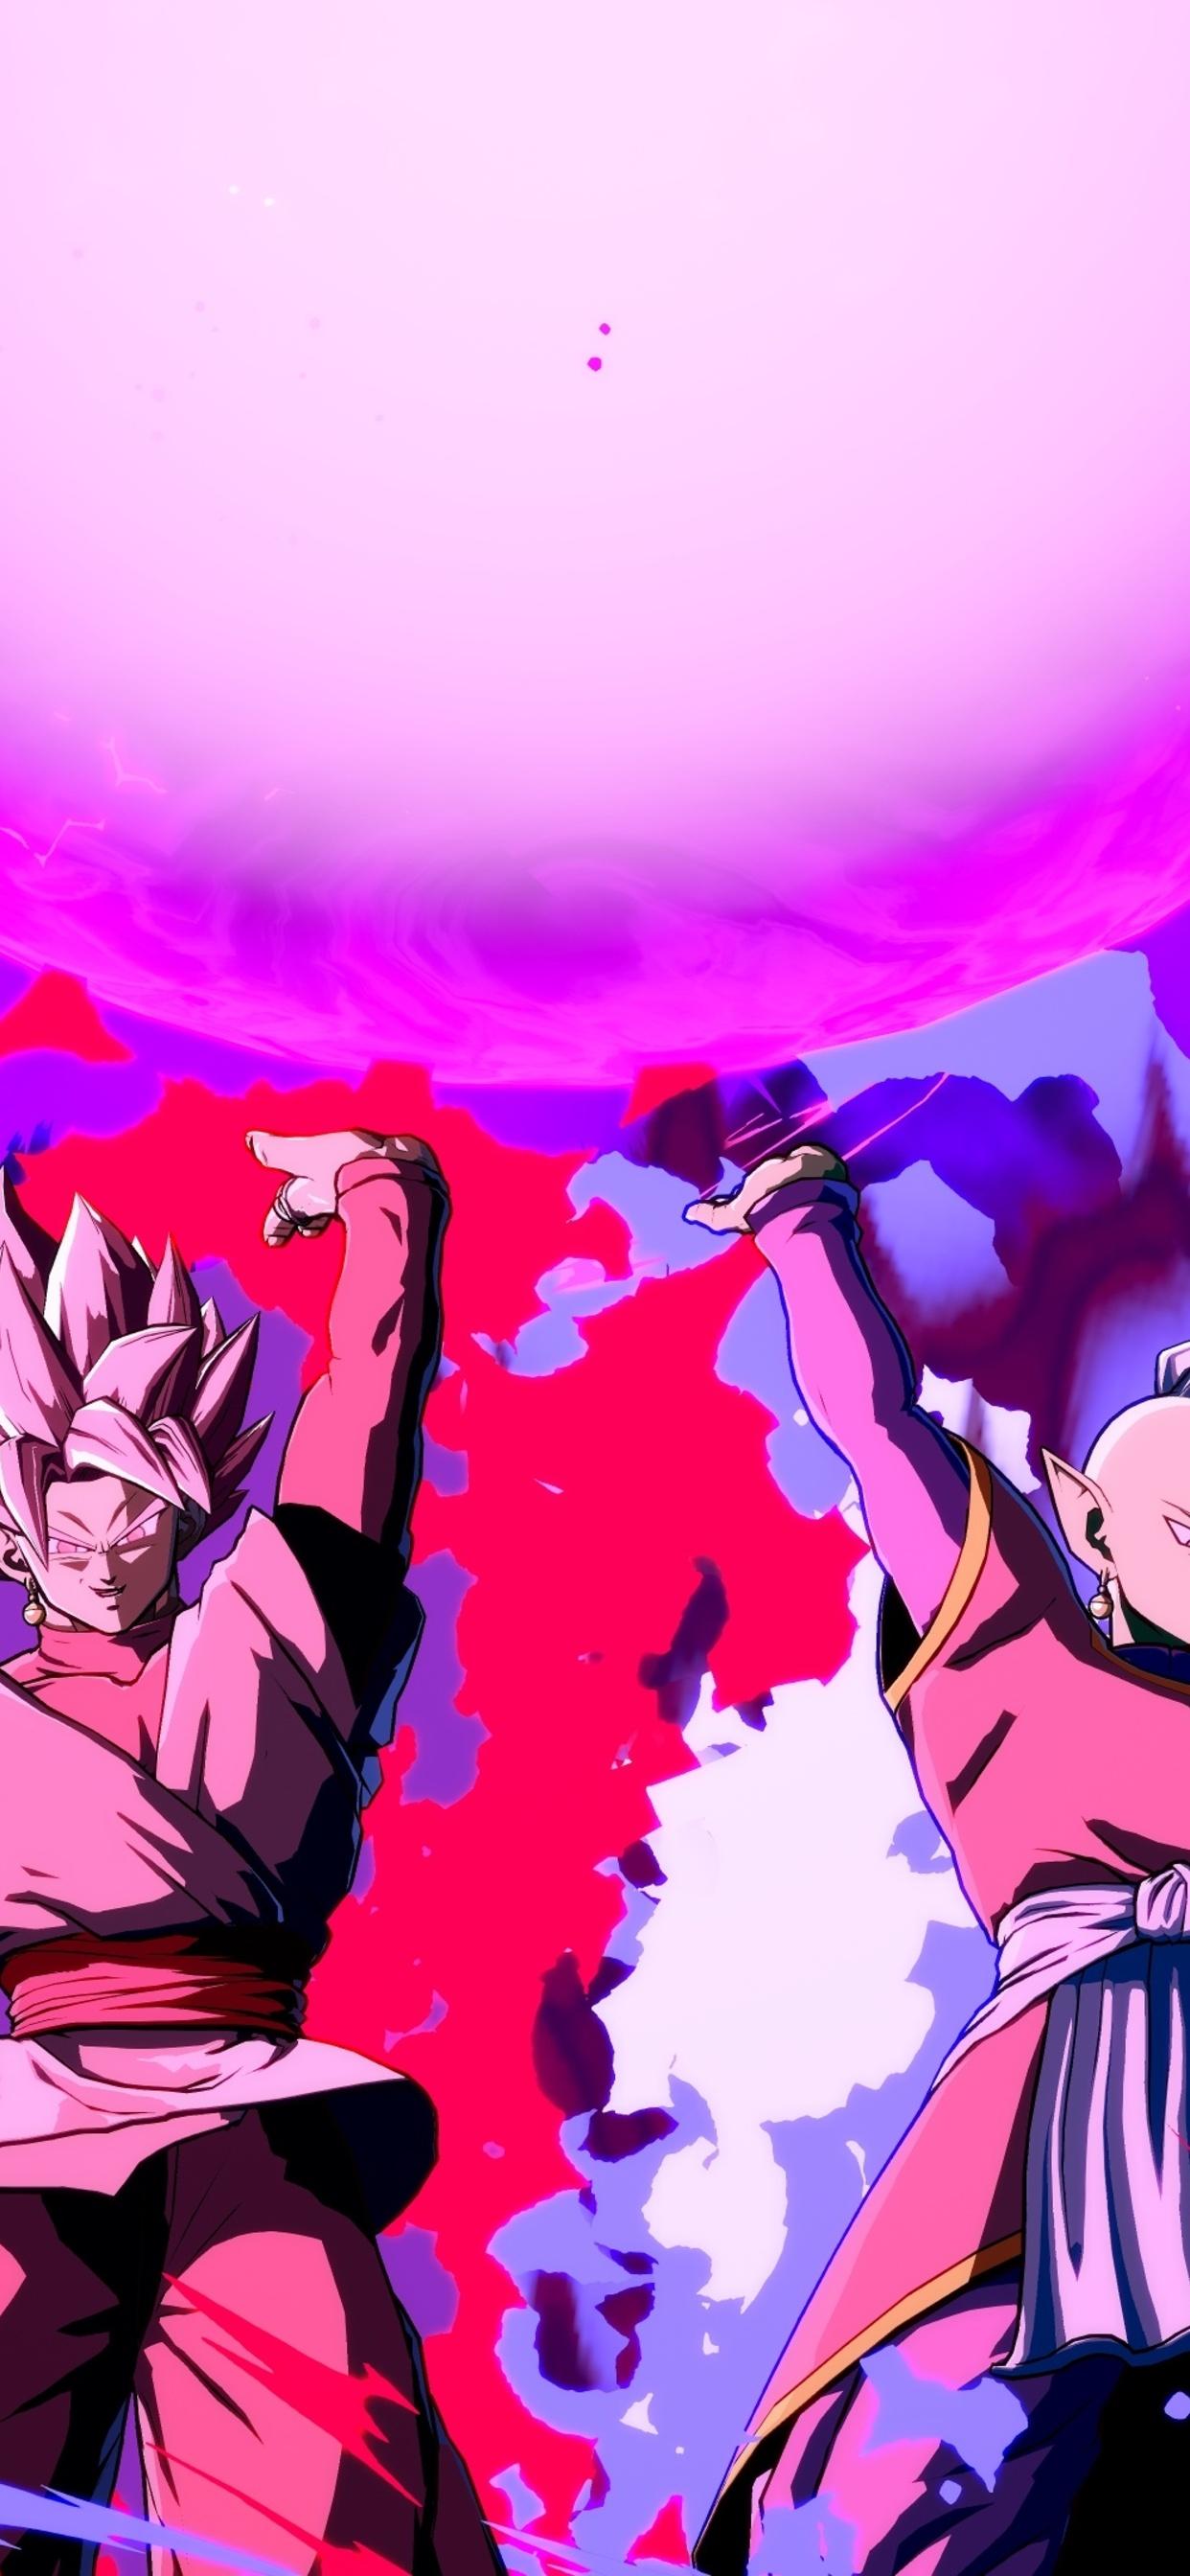 1242x2688 Black Goku Dragon Ball Fighterz Iphone Xs Max Hd 4k